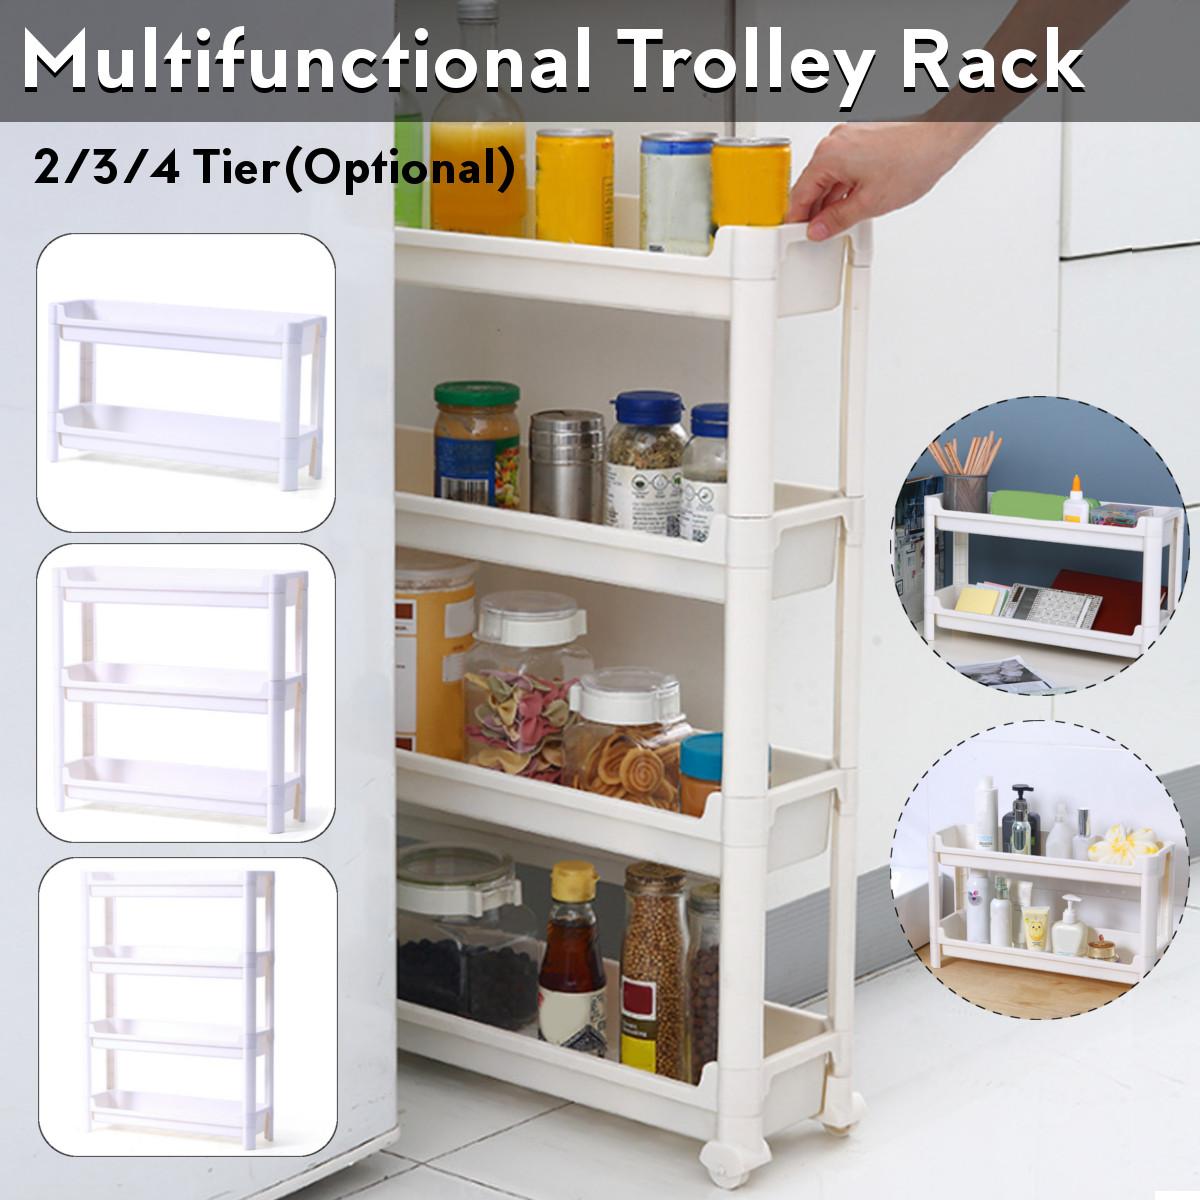 2 3 4 Tier Slim Slide Out Kitchen Trolley Rack Holder Storage Shelf Organiser With Wheels 4 Drawer Buy Online At Best Prices In Bangladesh Daraz Com Bd